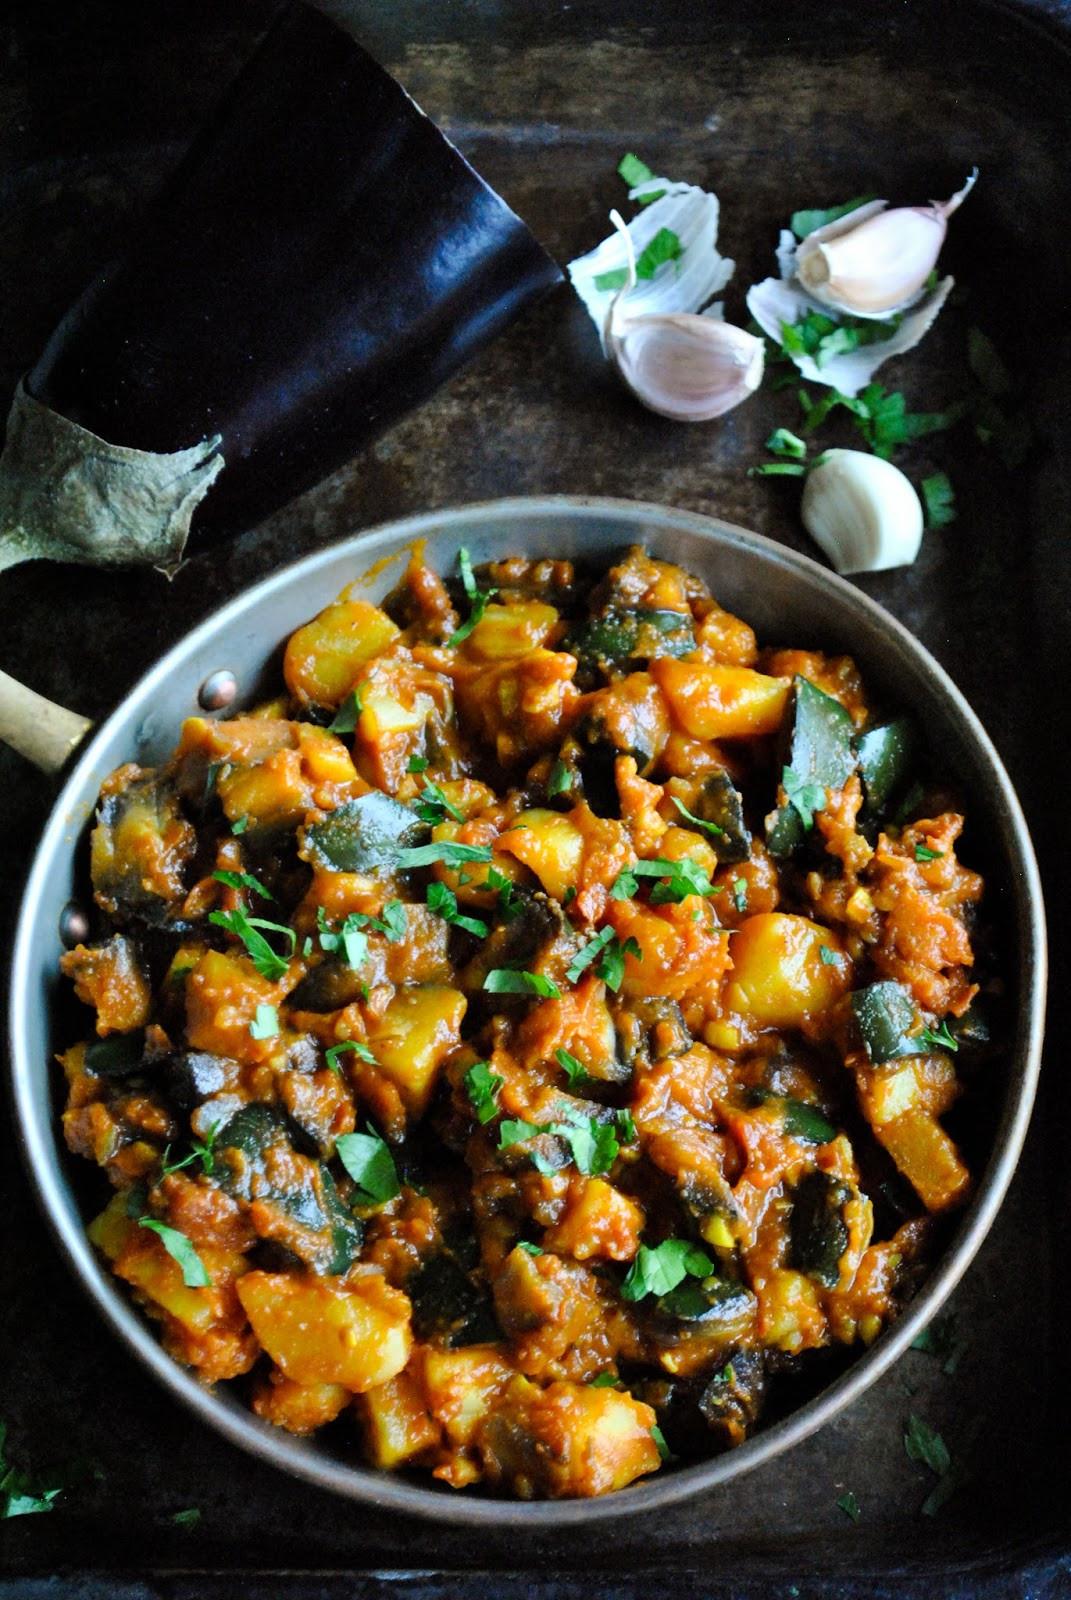 Vegetarian Recipes Video  15 delicious vegan recipes for beginners VeganSandra